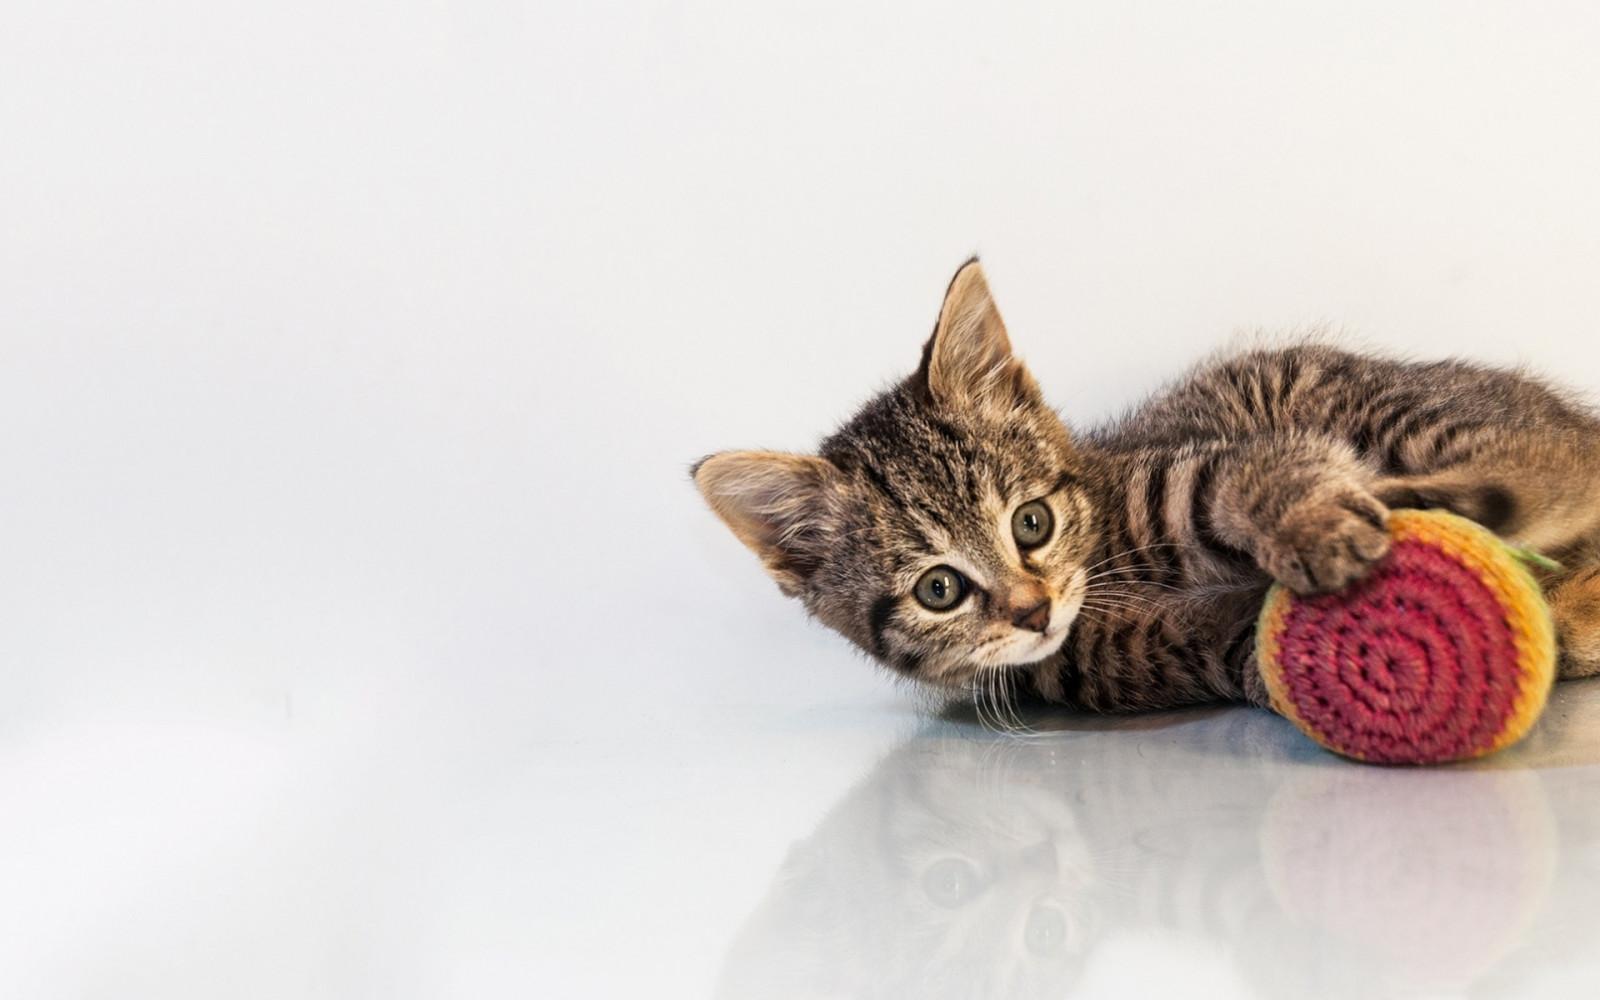 картинка с котенком для презентации лук